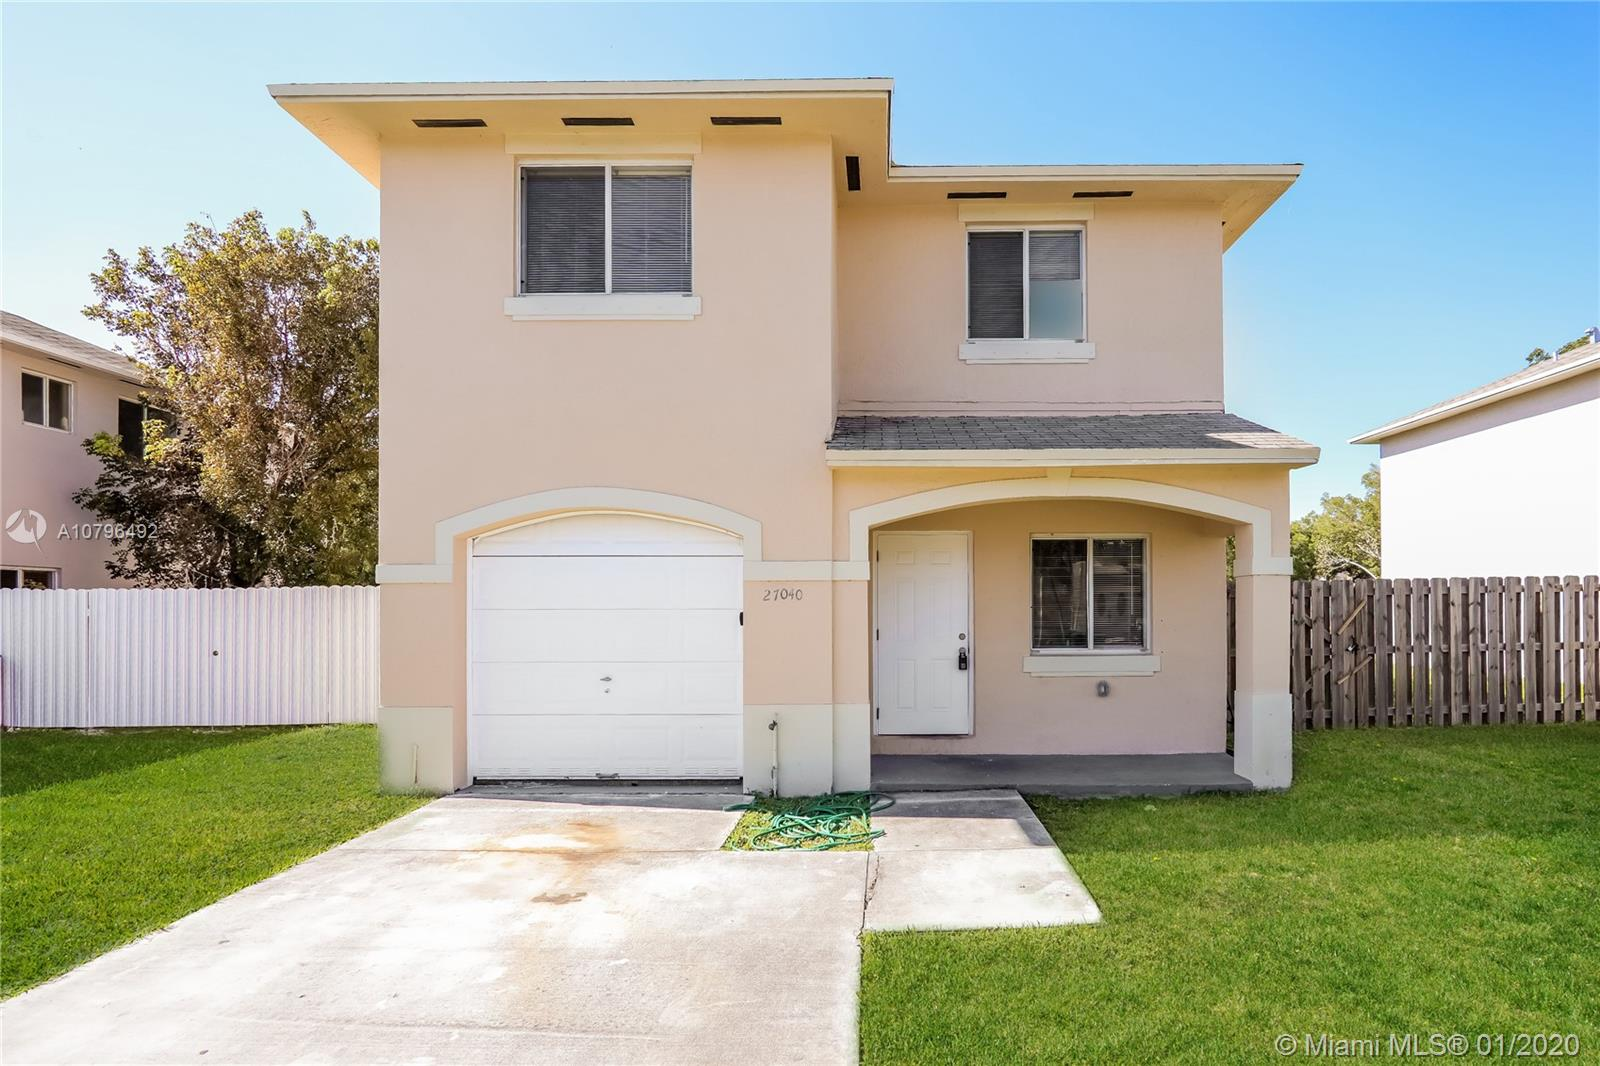 27040 SW 119th Ct, Homestead, FL 33032 - Homestead, FL real estate listing